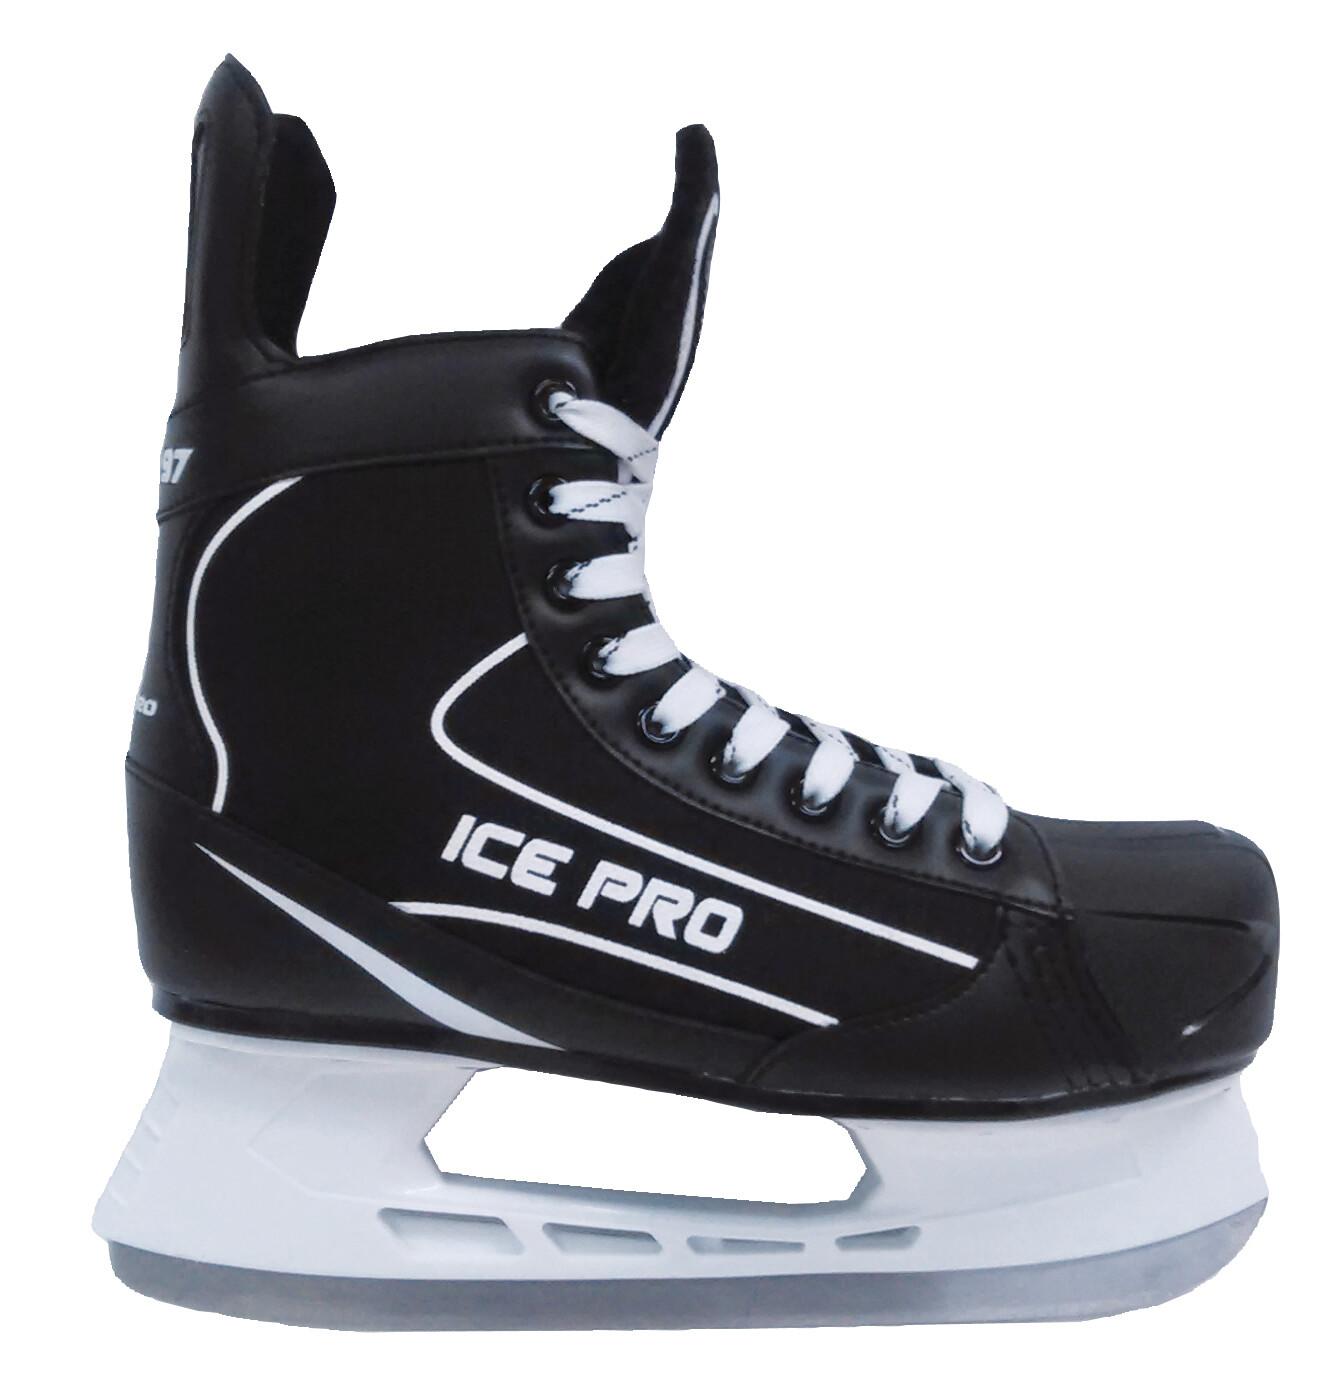 Patin hockey Ice Pro 97 senior noir